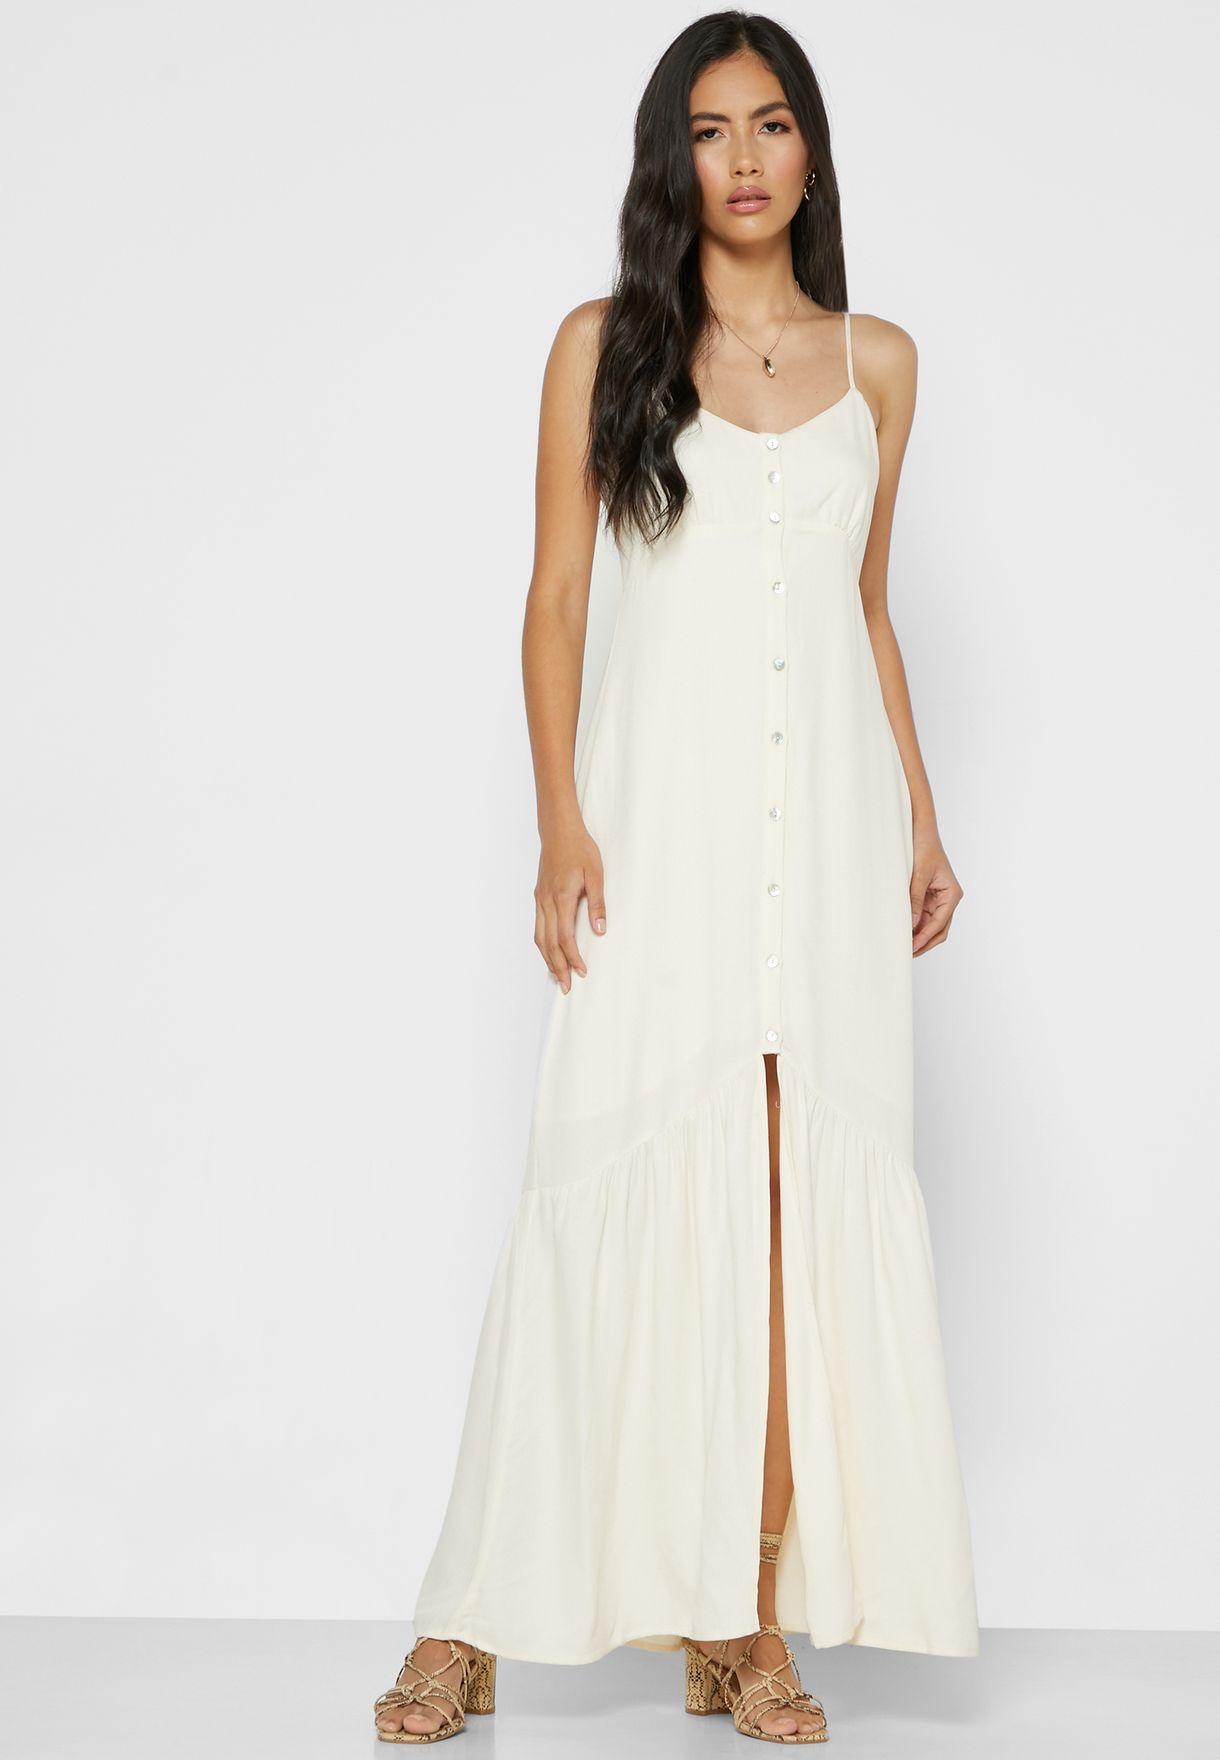 فستان بحمالات كتف وشق امامي